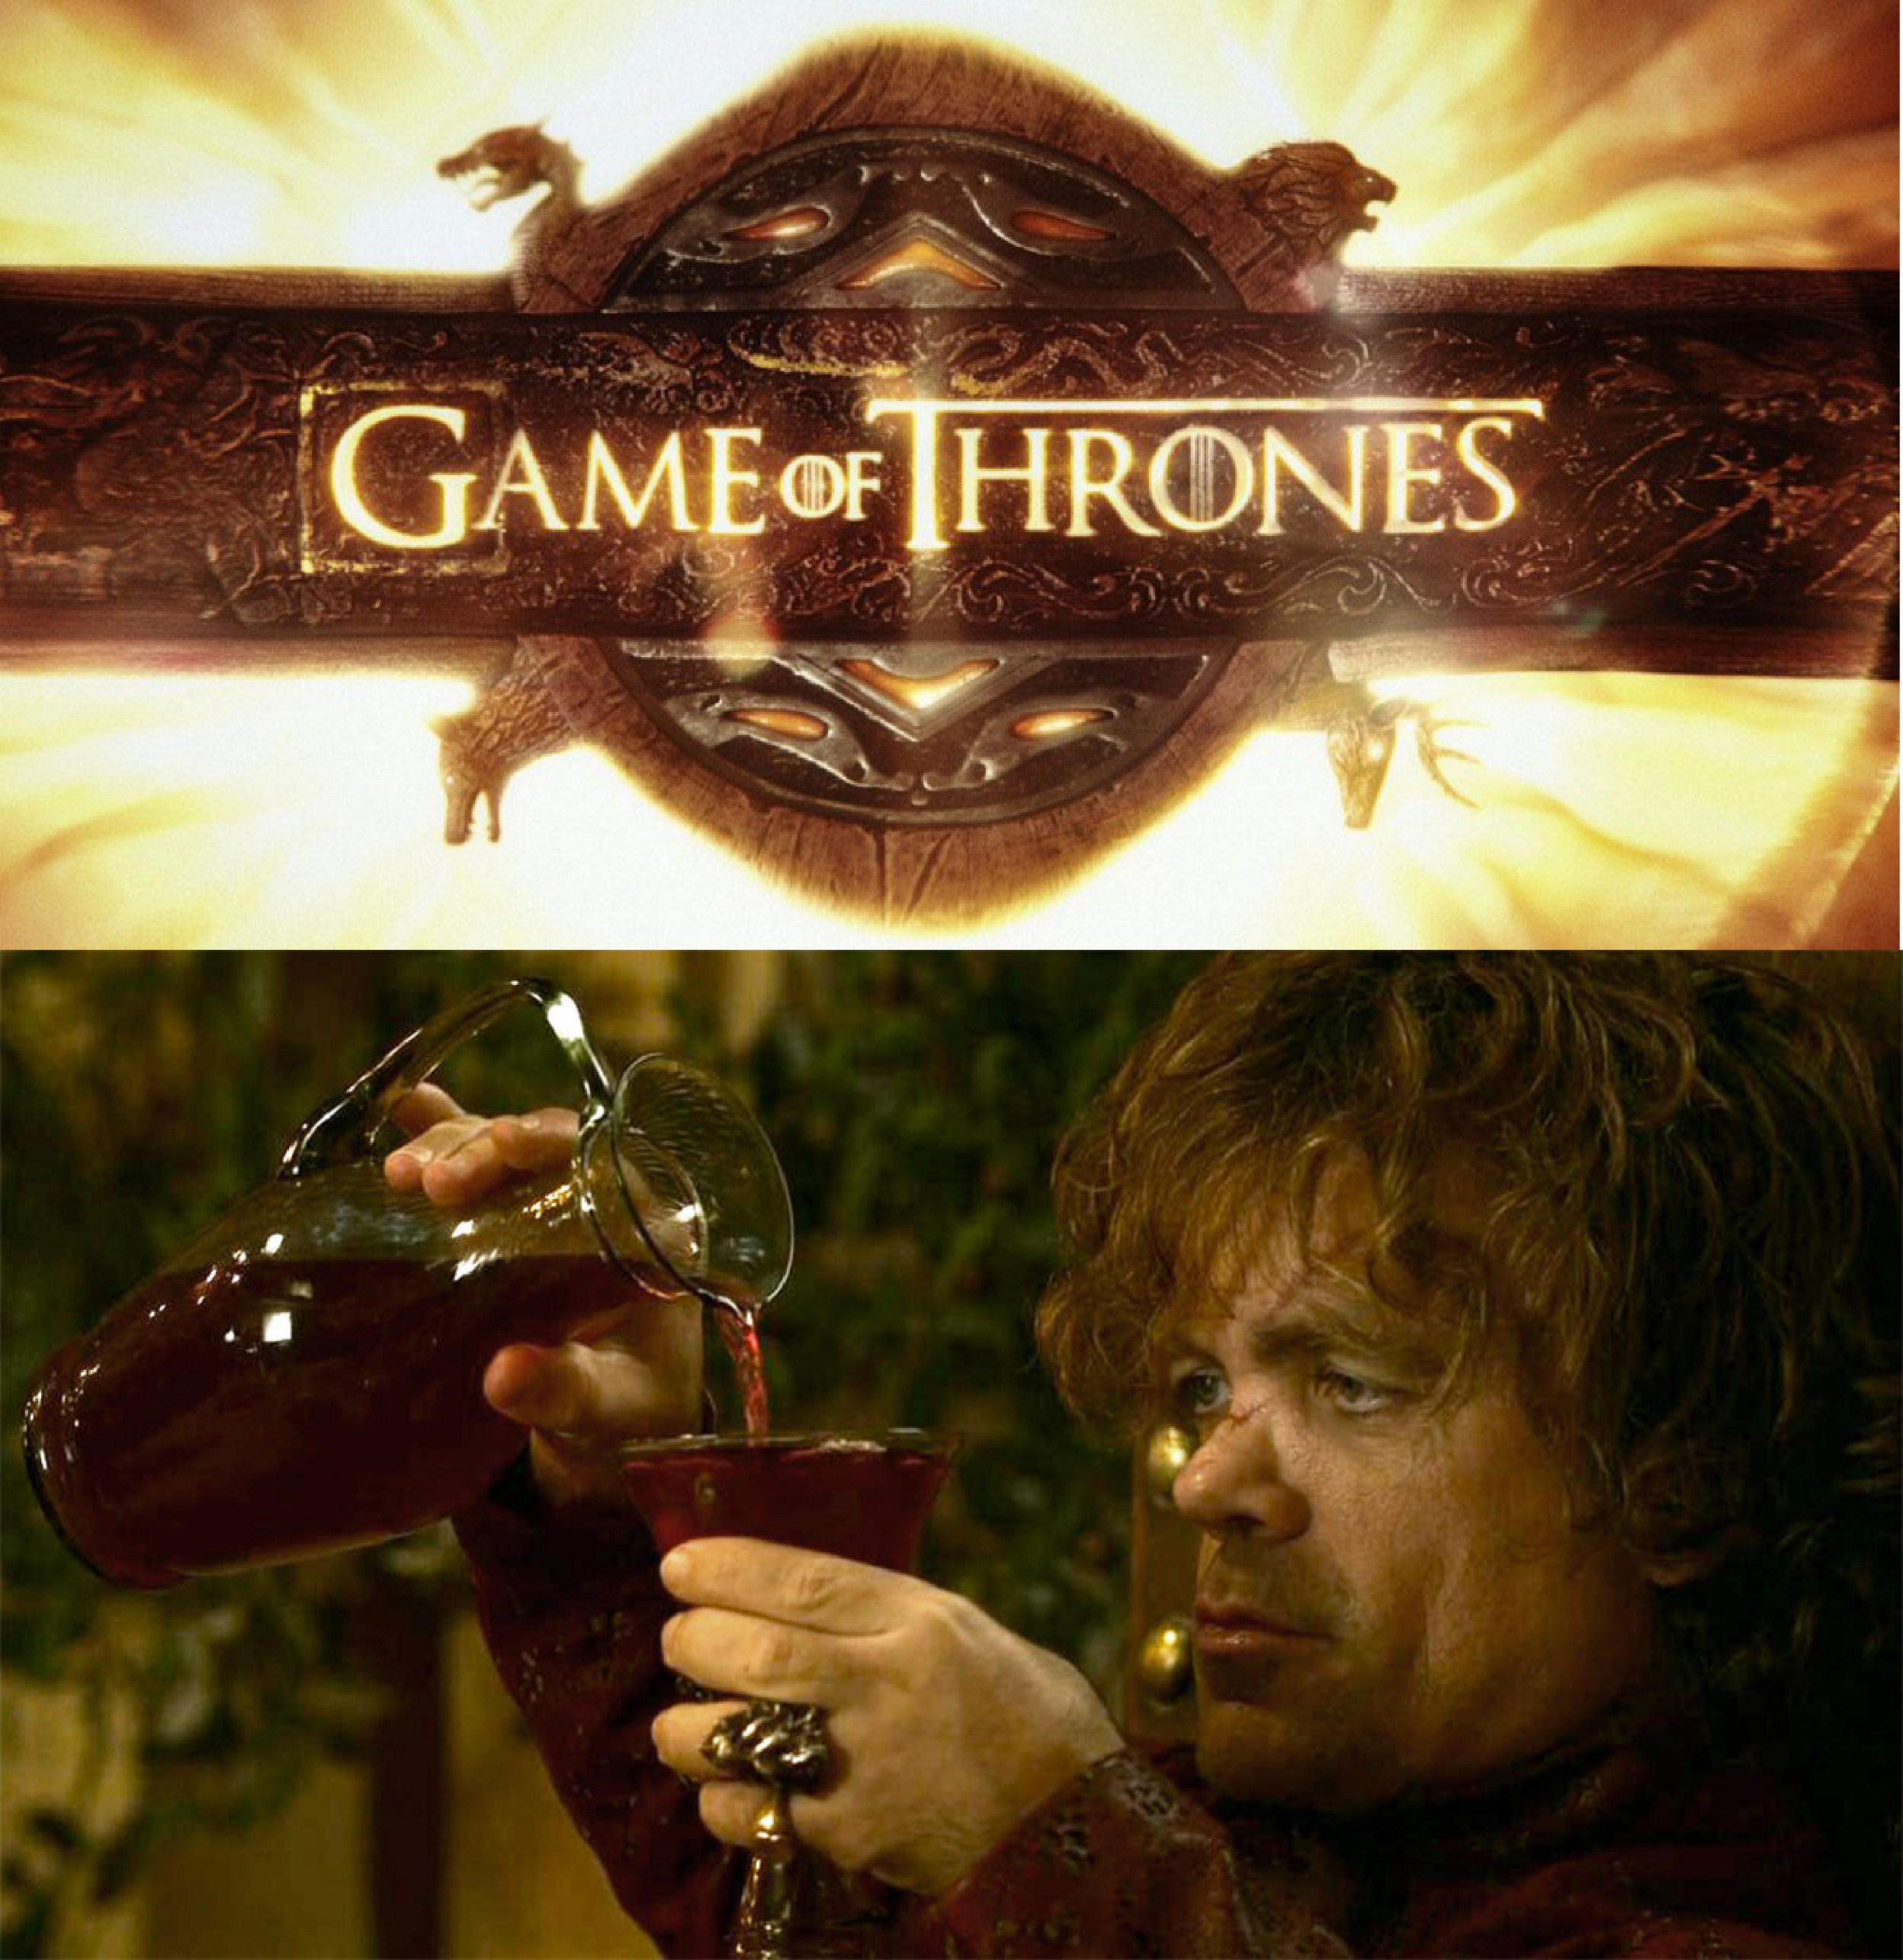 GOT Season 8 Season Finale Screening & Medieval Dinner